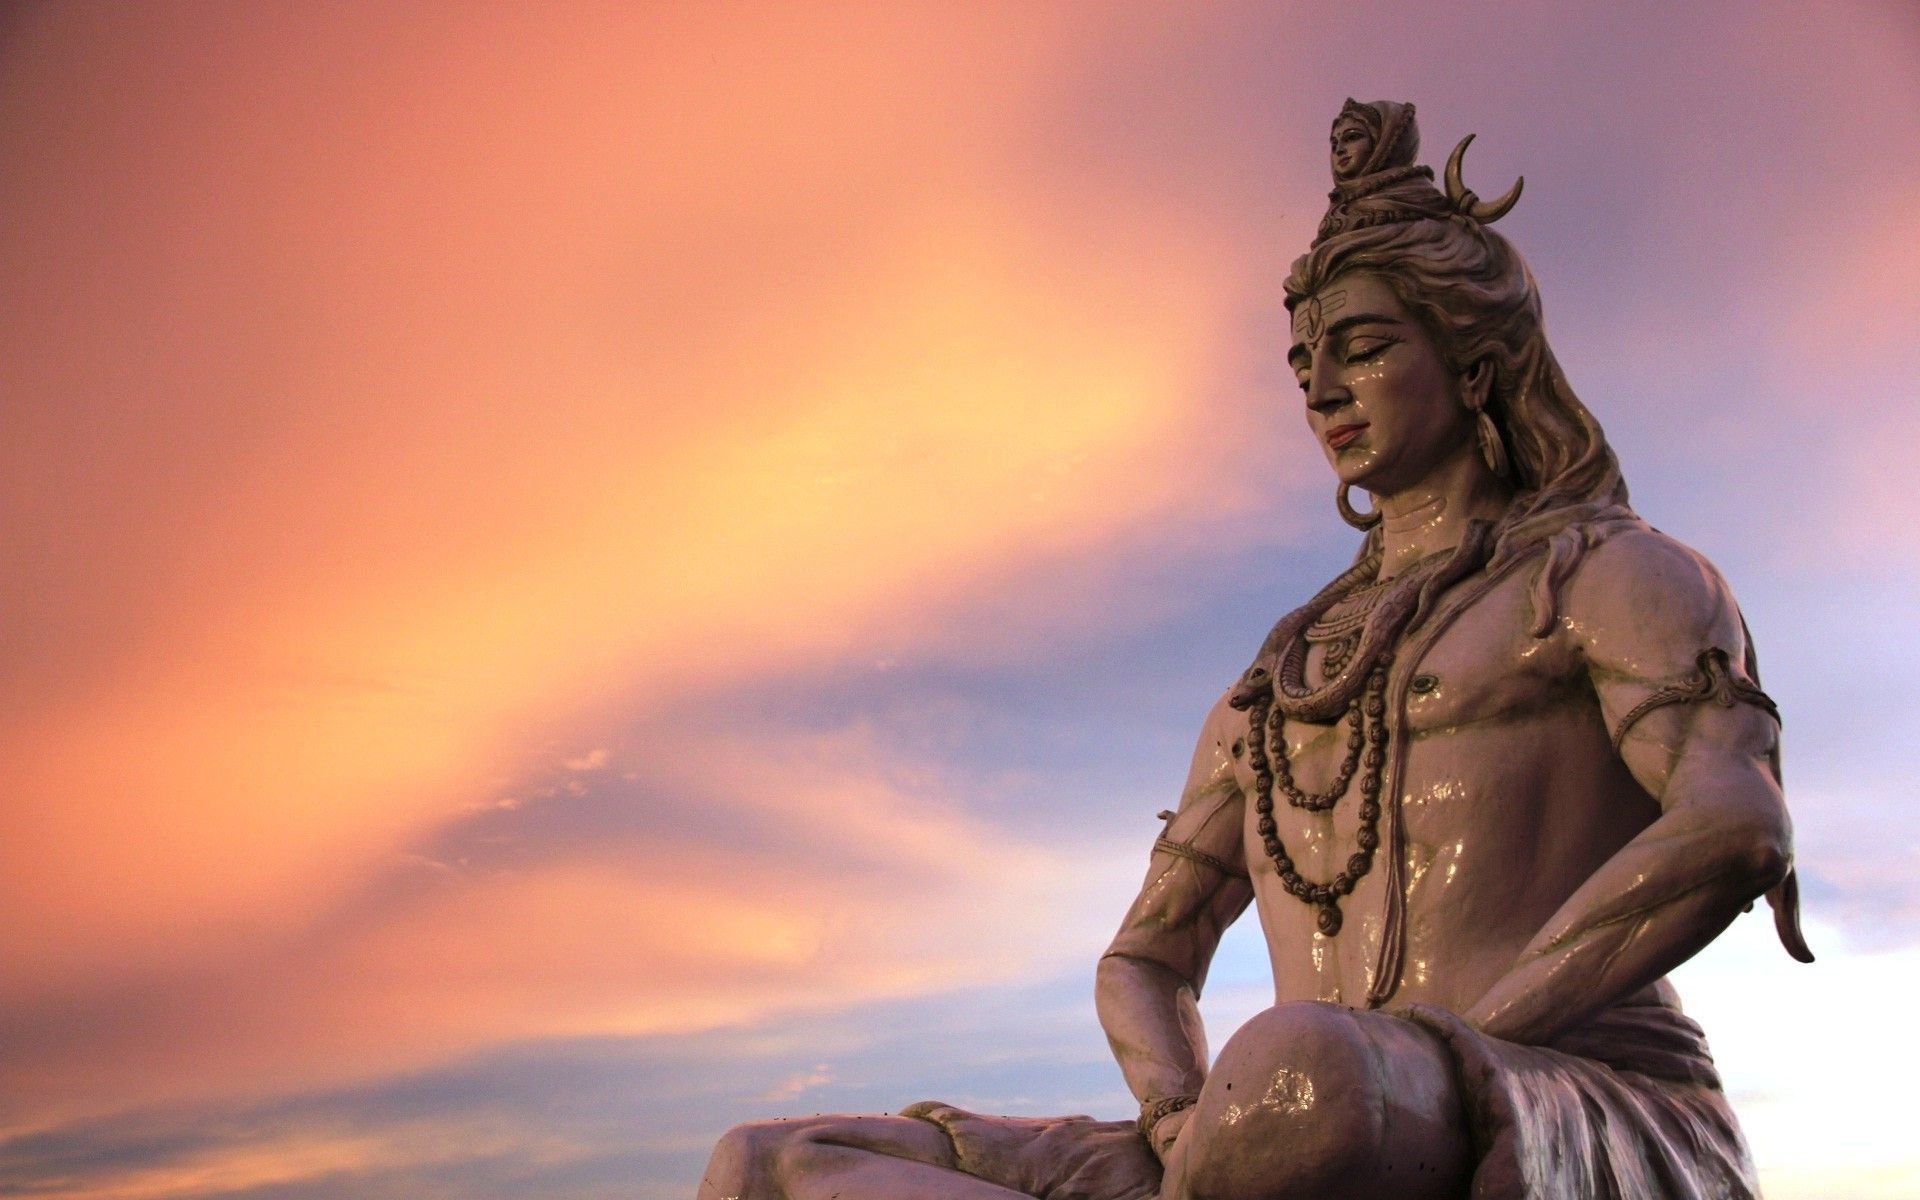 Hd Wallpapers For Desktop Lord Shiva